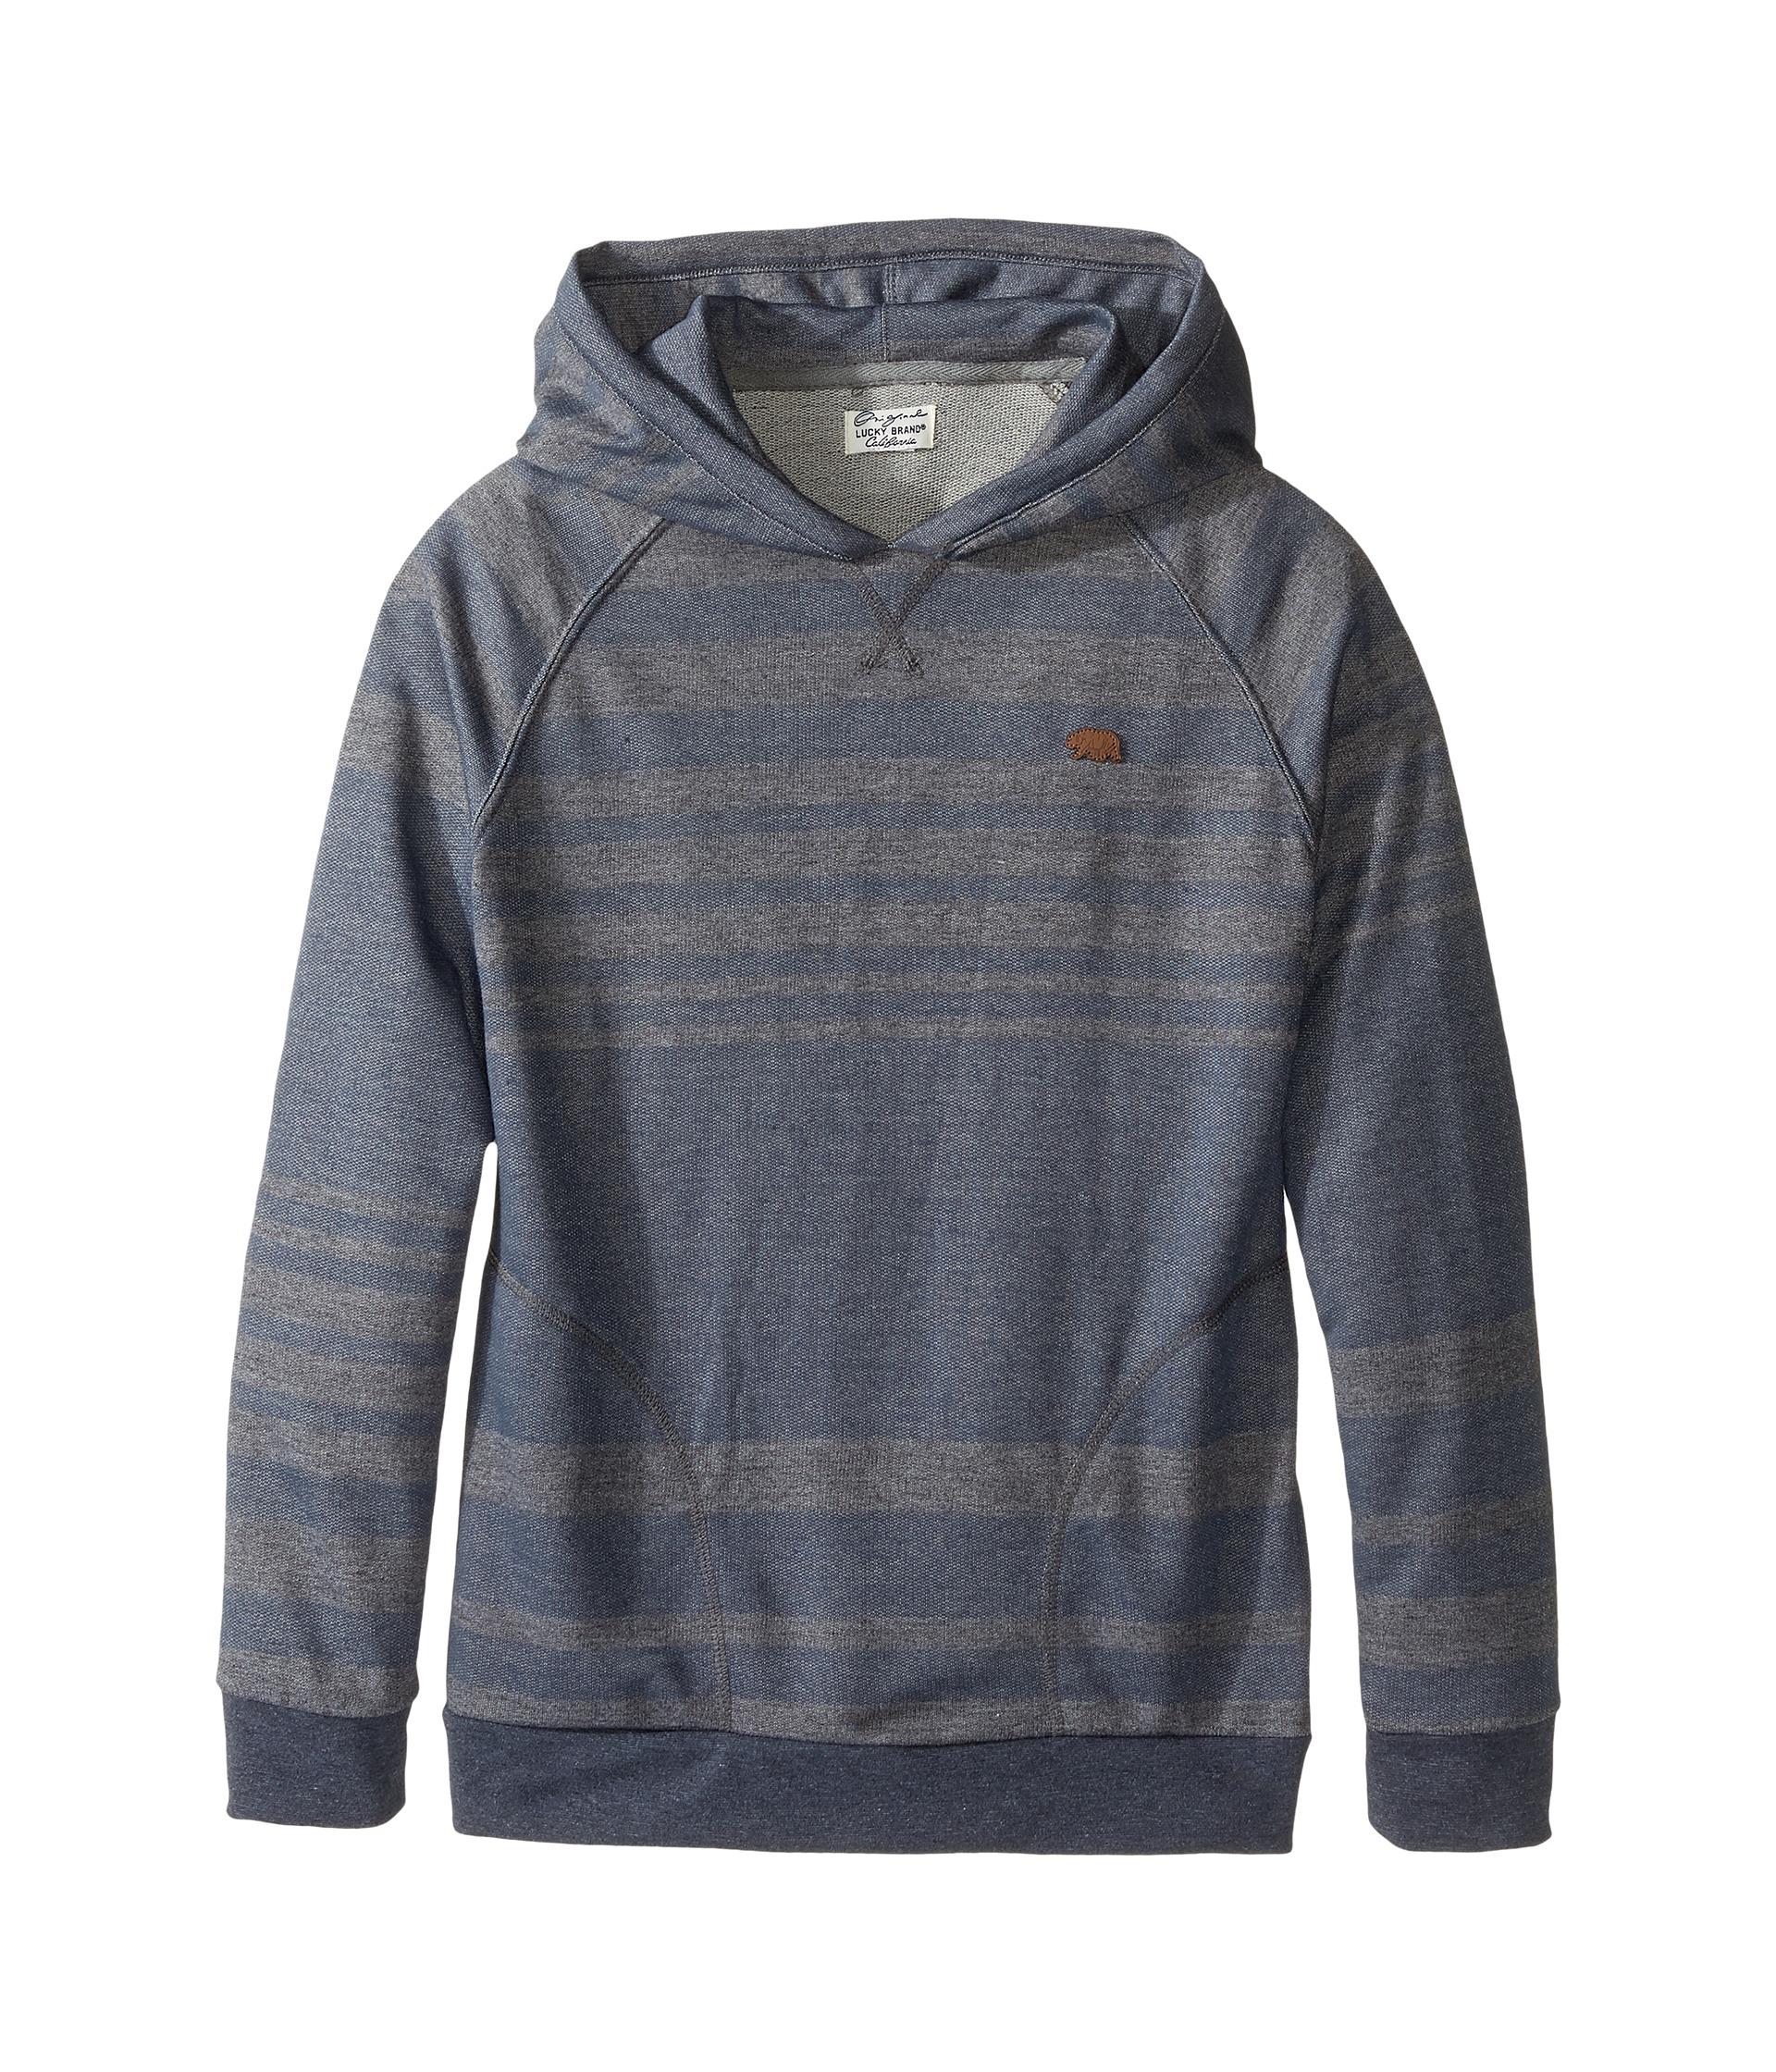 Lucky brand hoodies